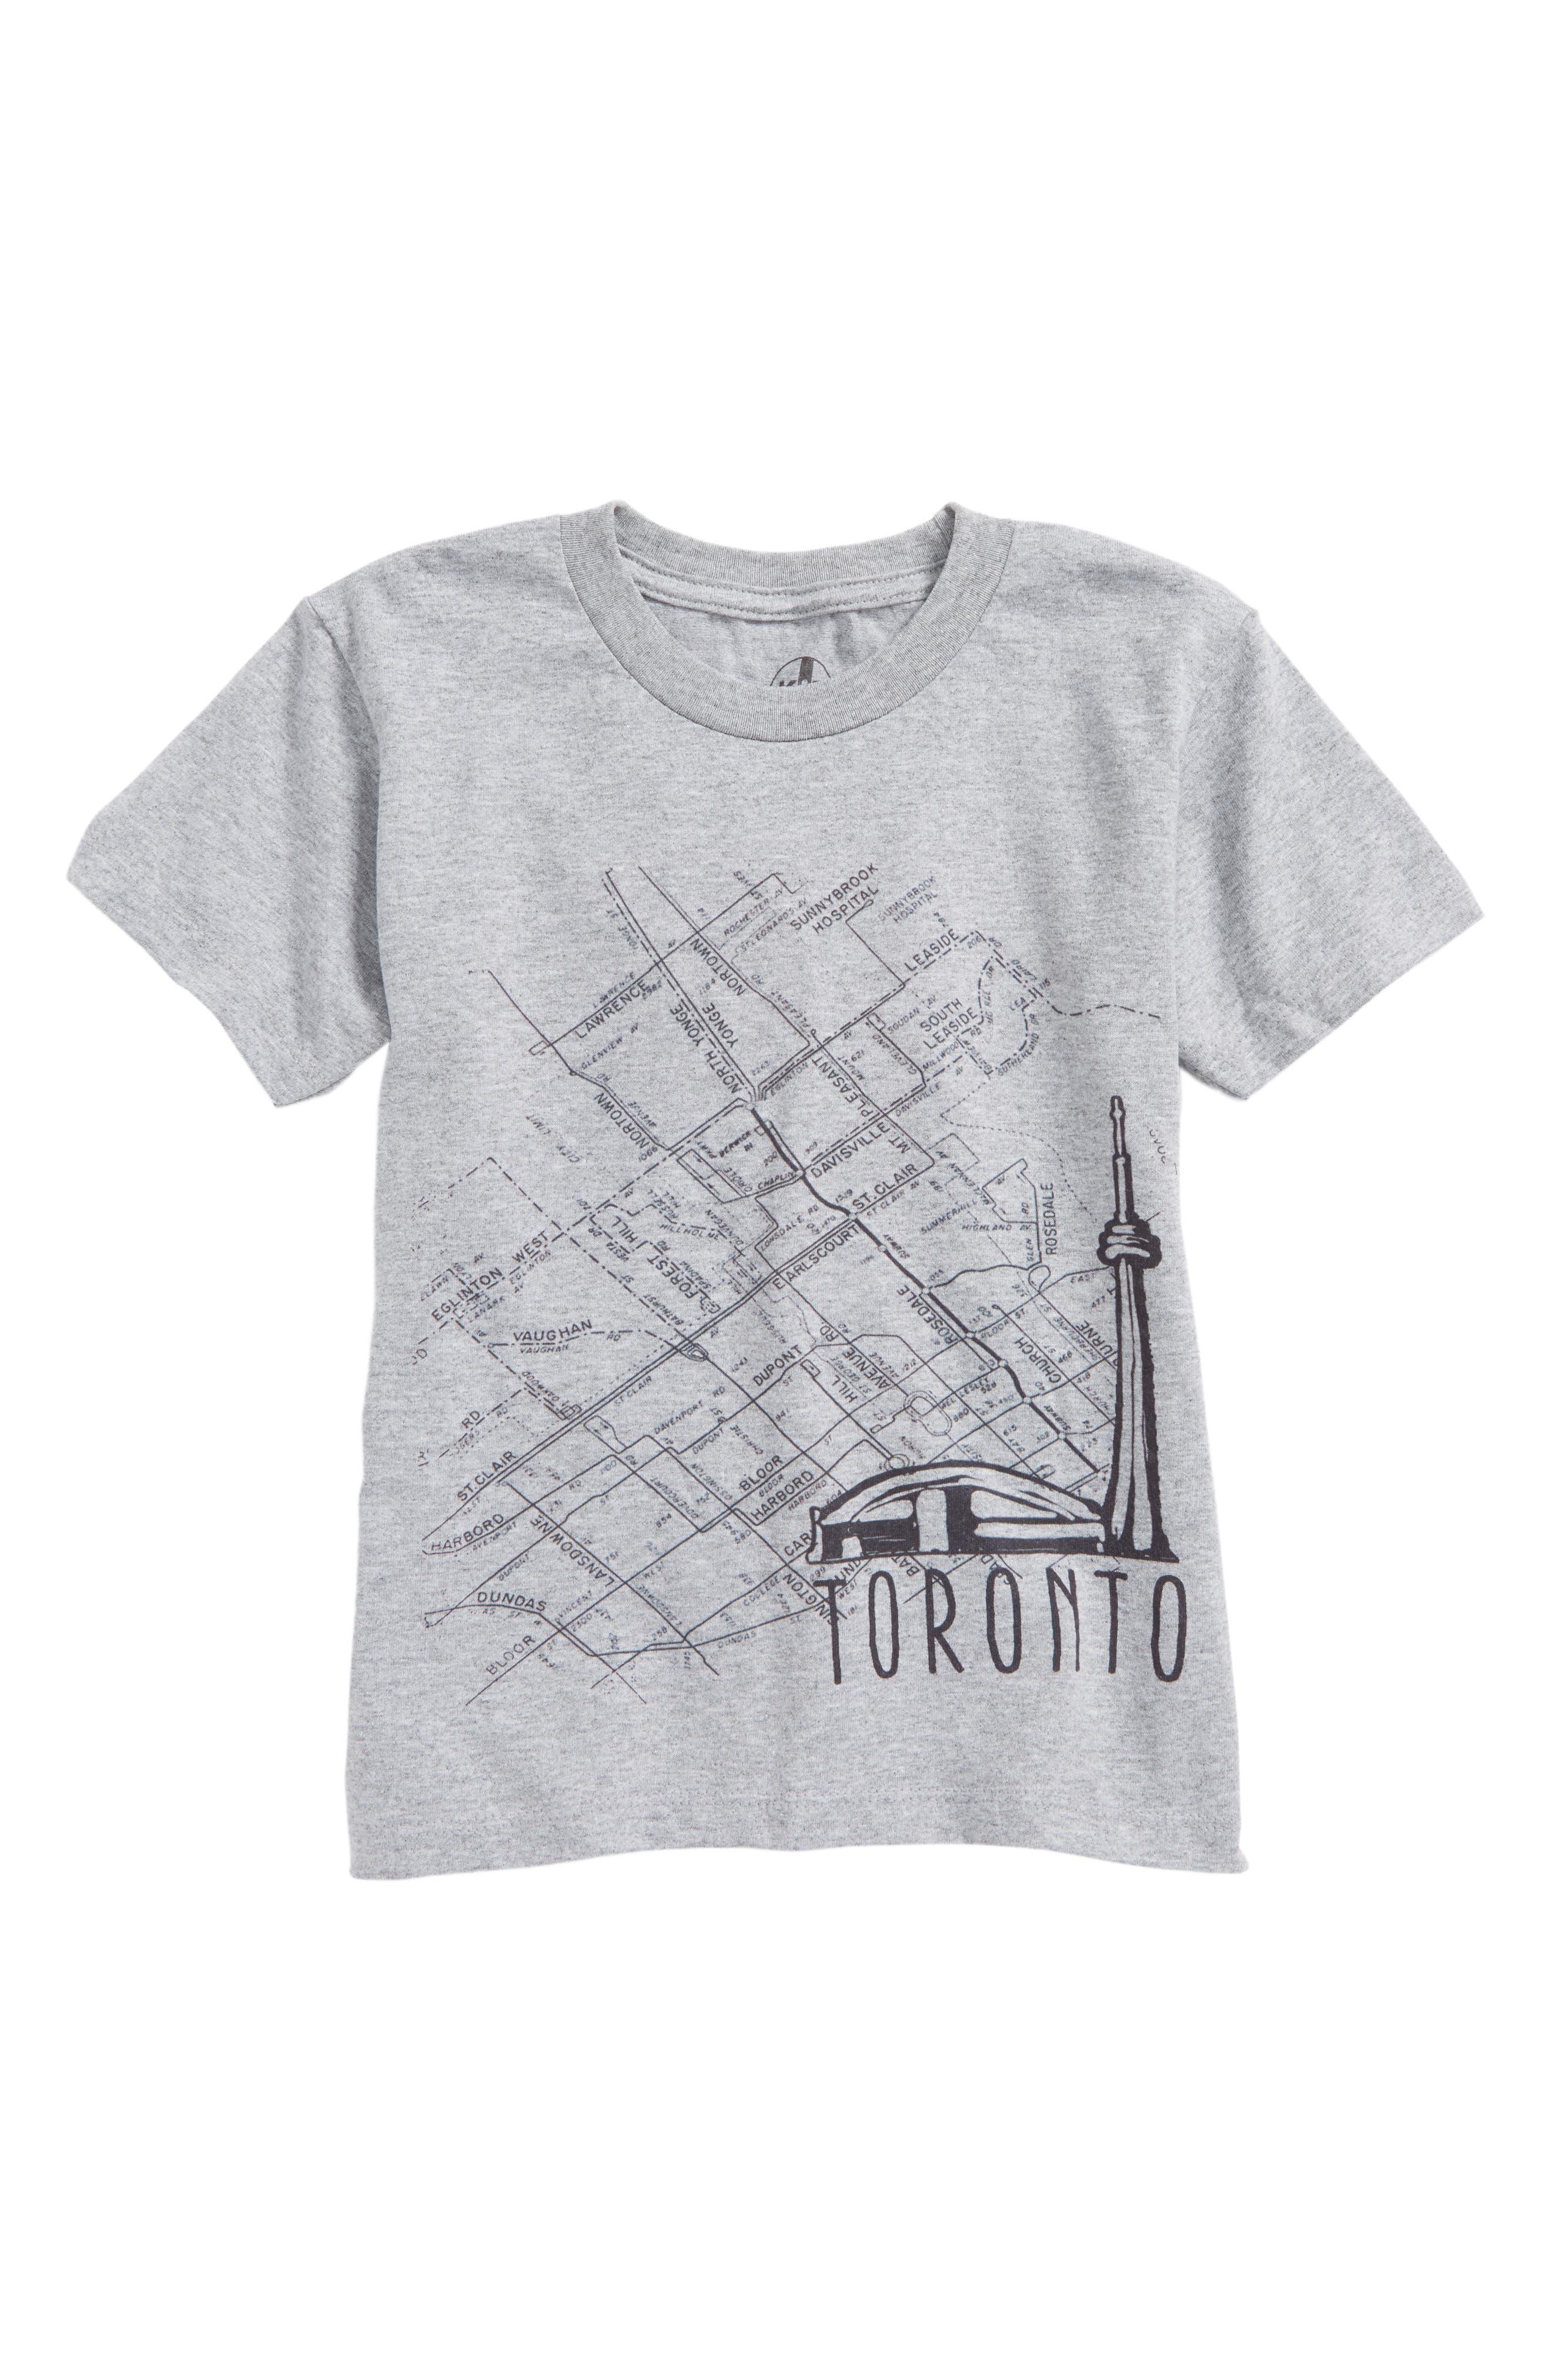 Alternate Image 1 Selected - Kid Dangerous Toronto Map Graphic T-Shirt (Toddler Boys & Little Boys)